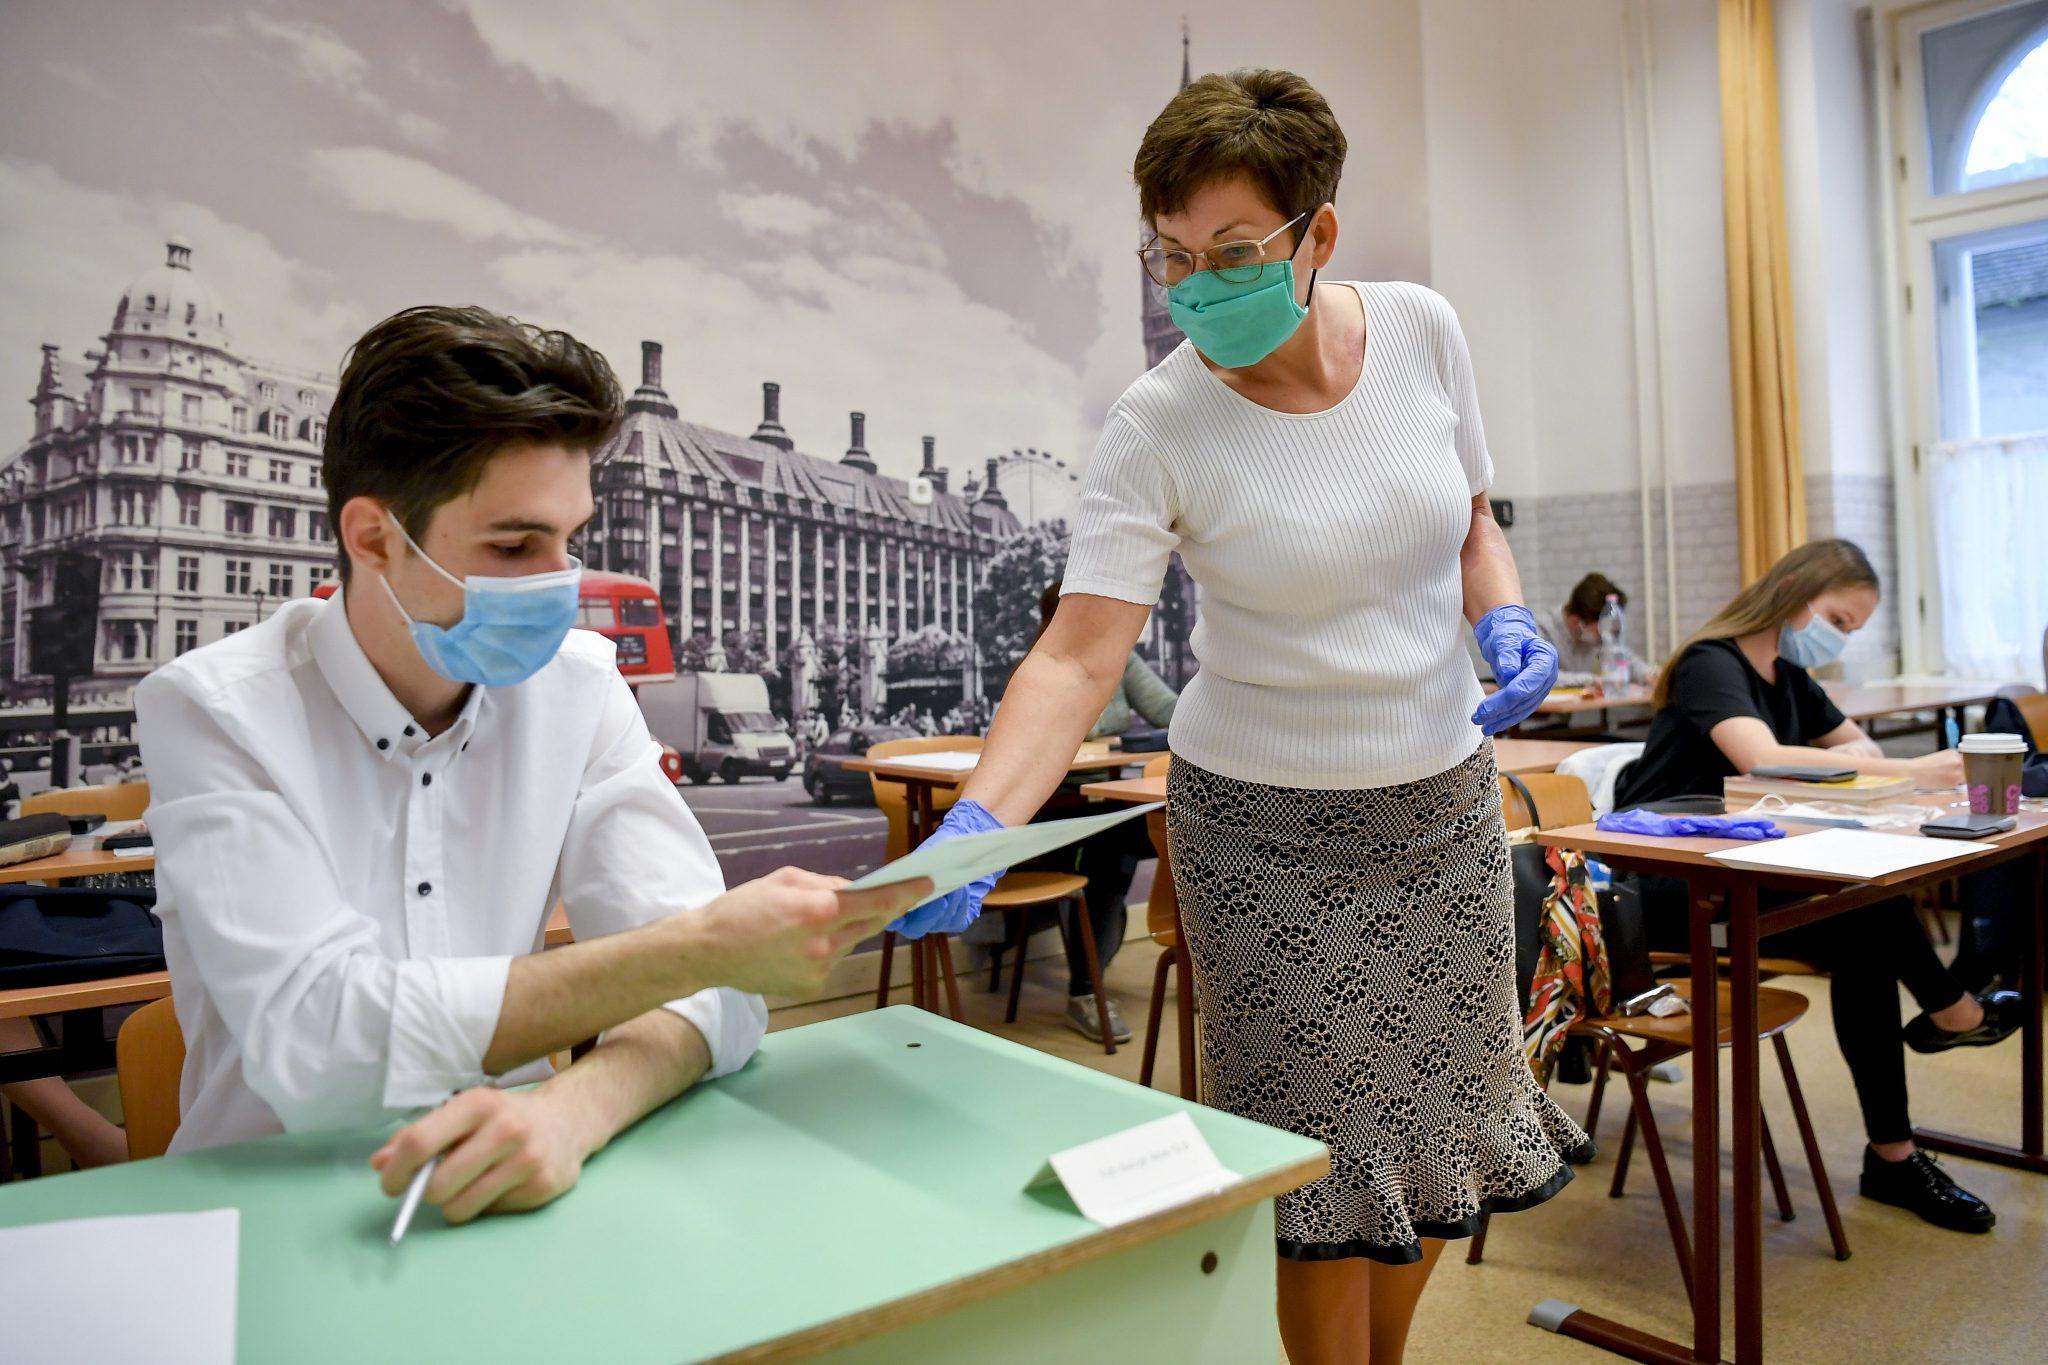 Gov't to Start Vaccination of Teachers Next Week